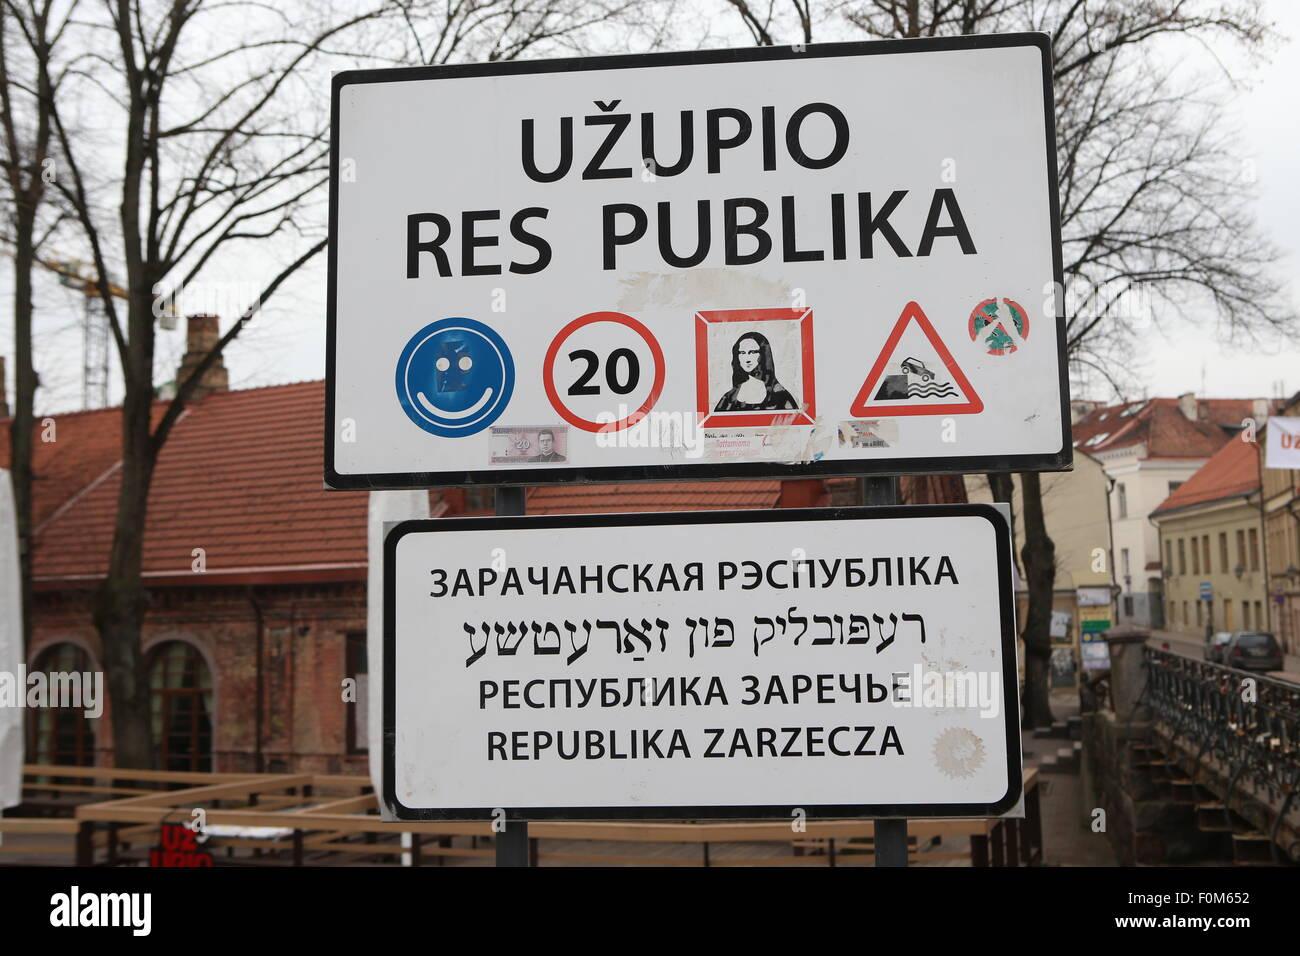 Republic of Uzupis (Uzupio Res Publika).Vilnius,Lithuania,Europe Stock Photo